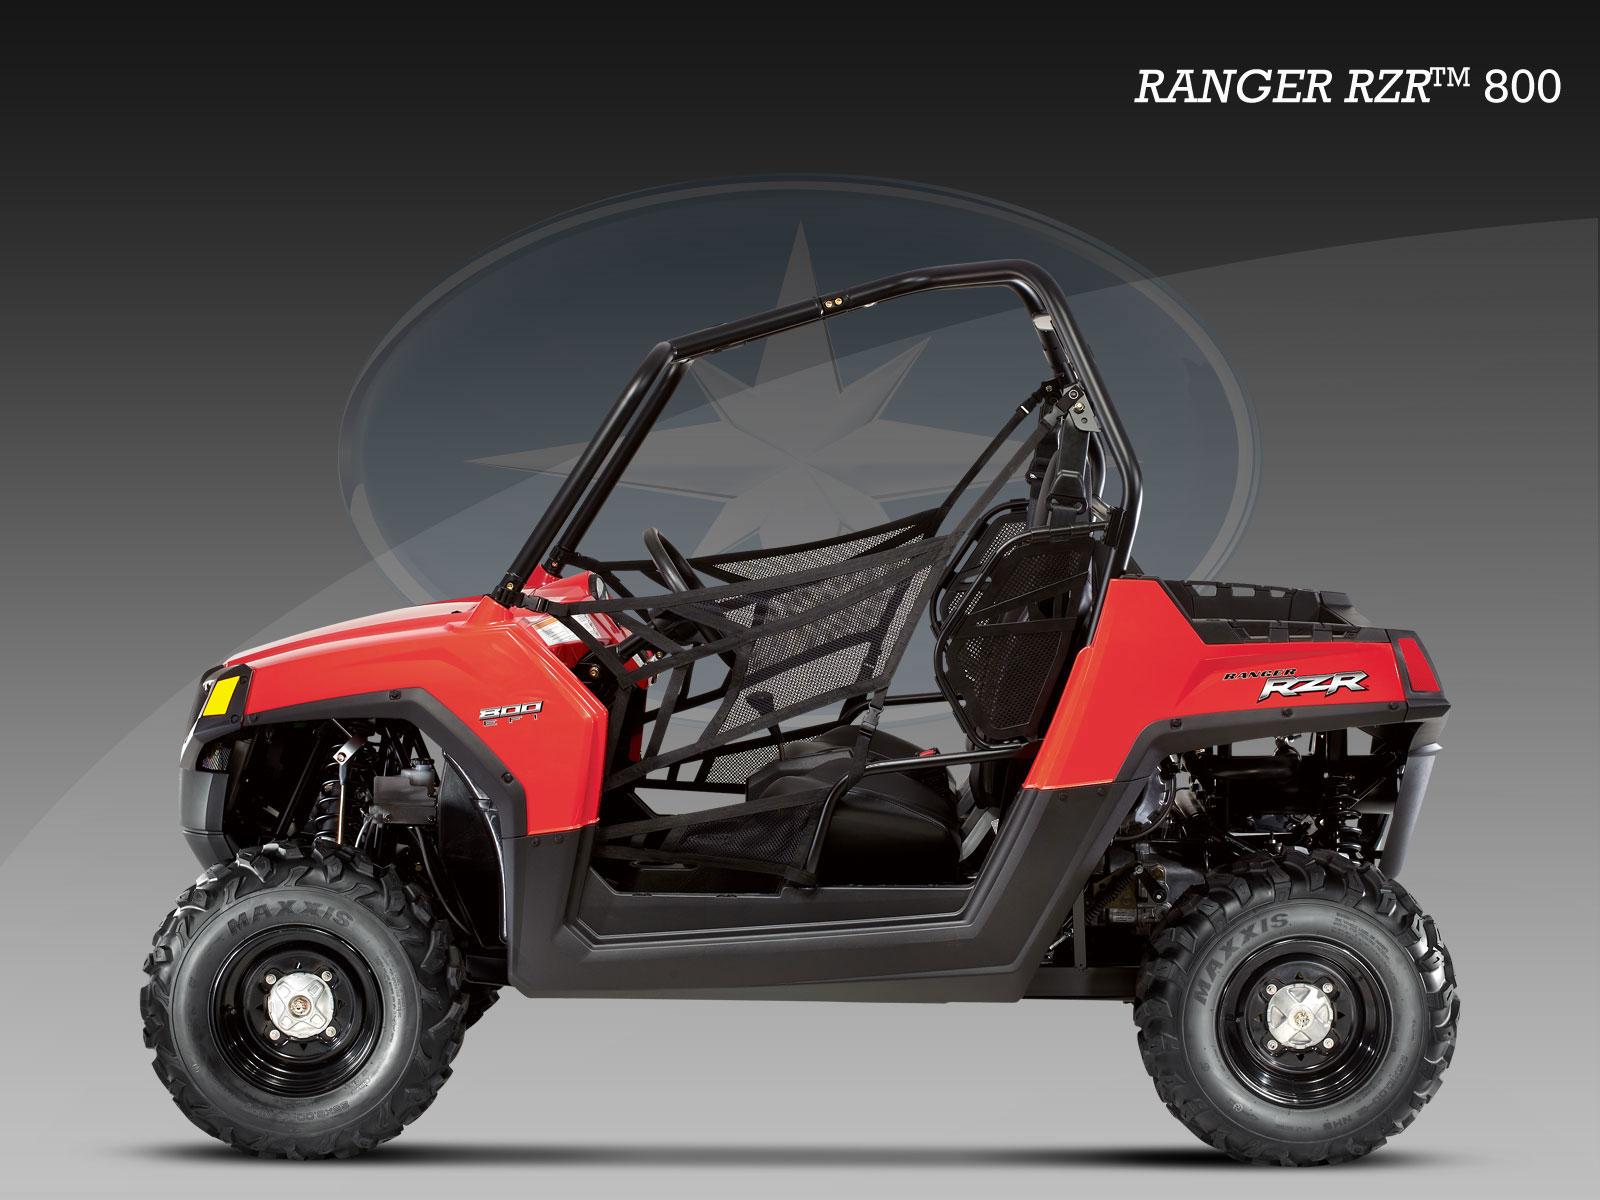 polaris ranger rzr 800 specs 2009 2010 autoevolution. Black Bedroom Furniture Sets. Home Design Ideas